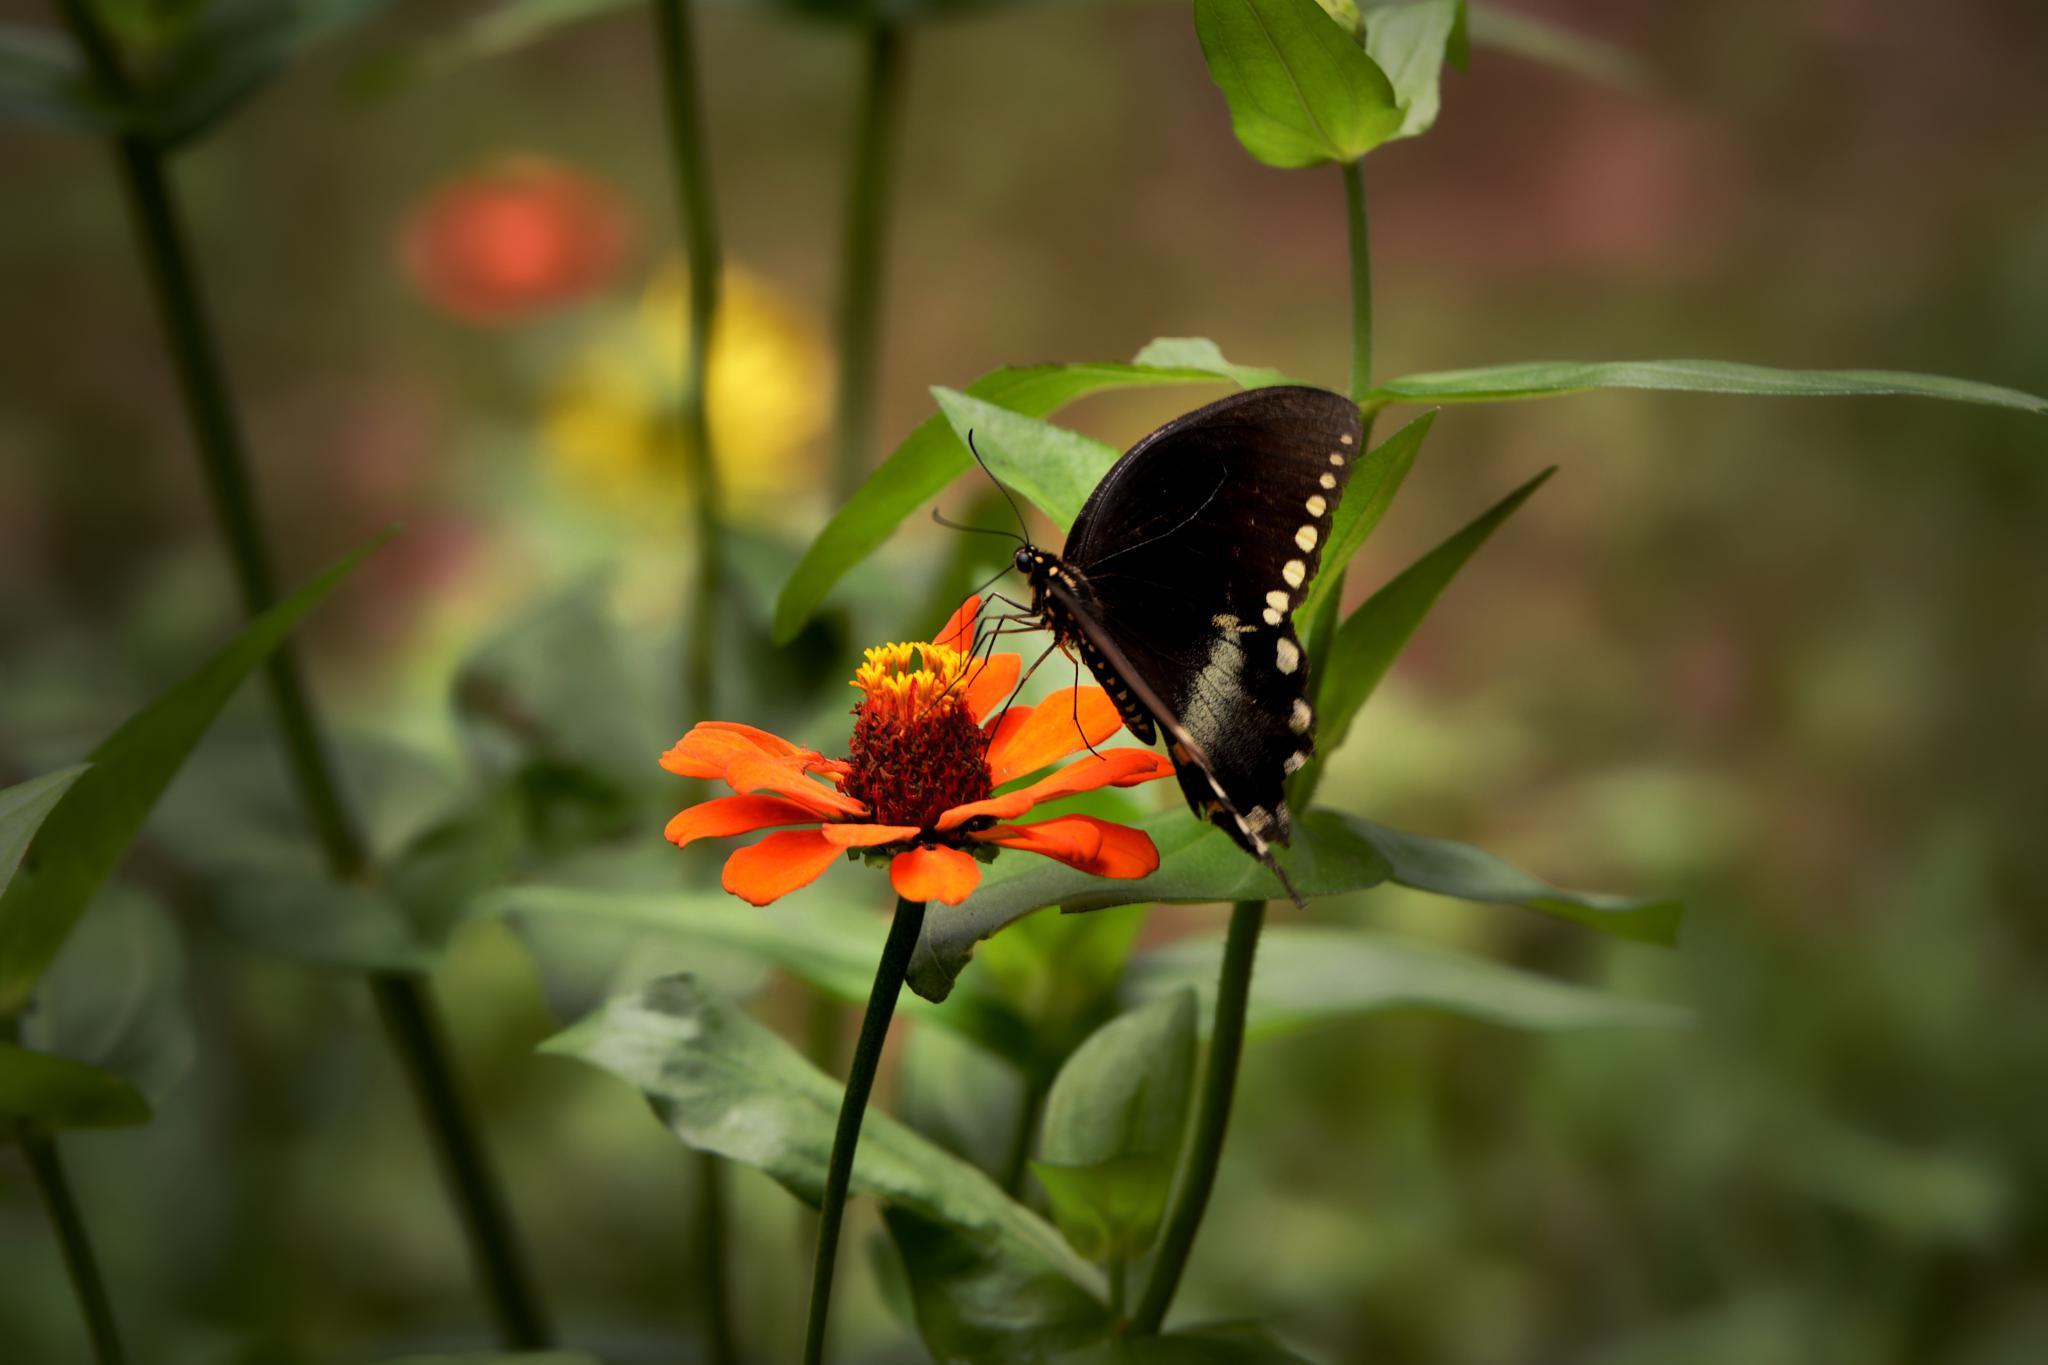 Black on Orange by Cherie Steele